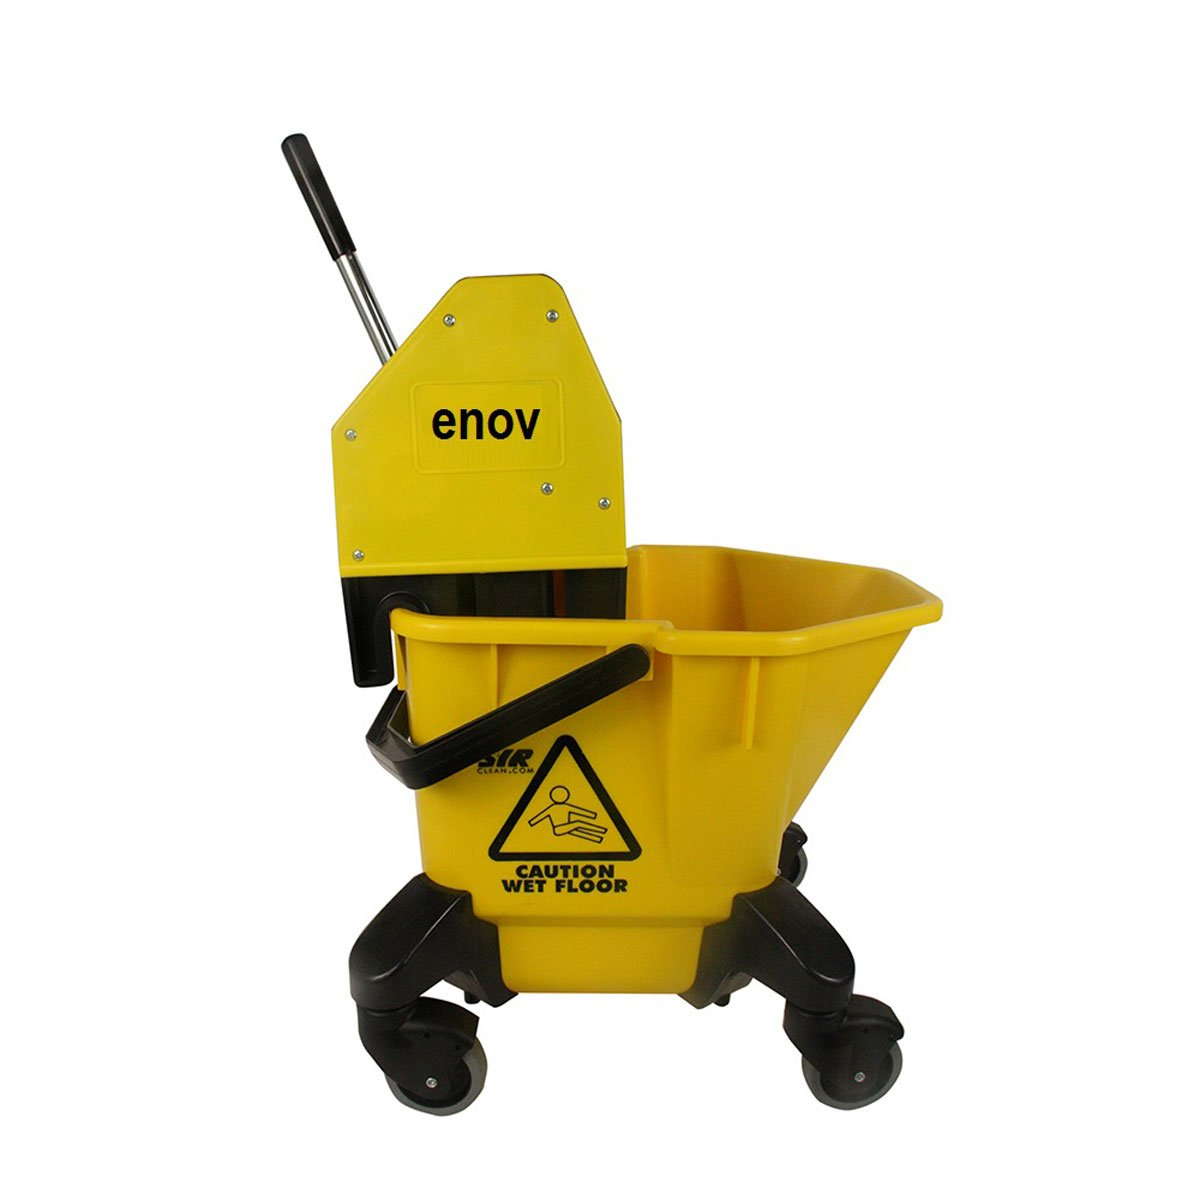 Enov HBR020-YL Kentucky Bucket and Wringer, 20 L Capacity, Yellow